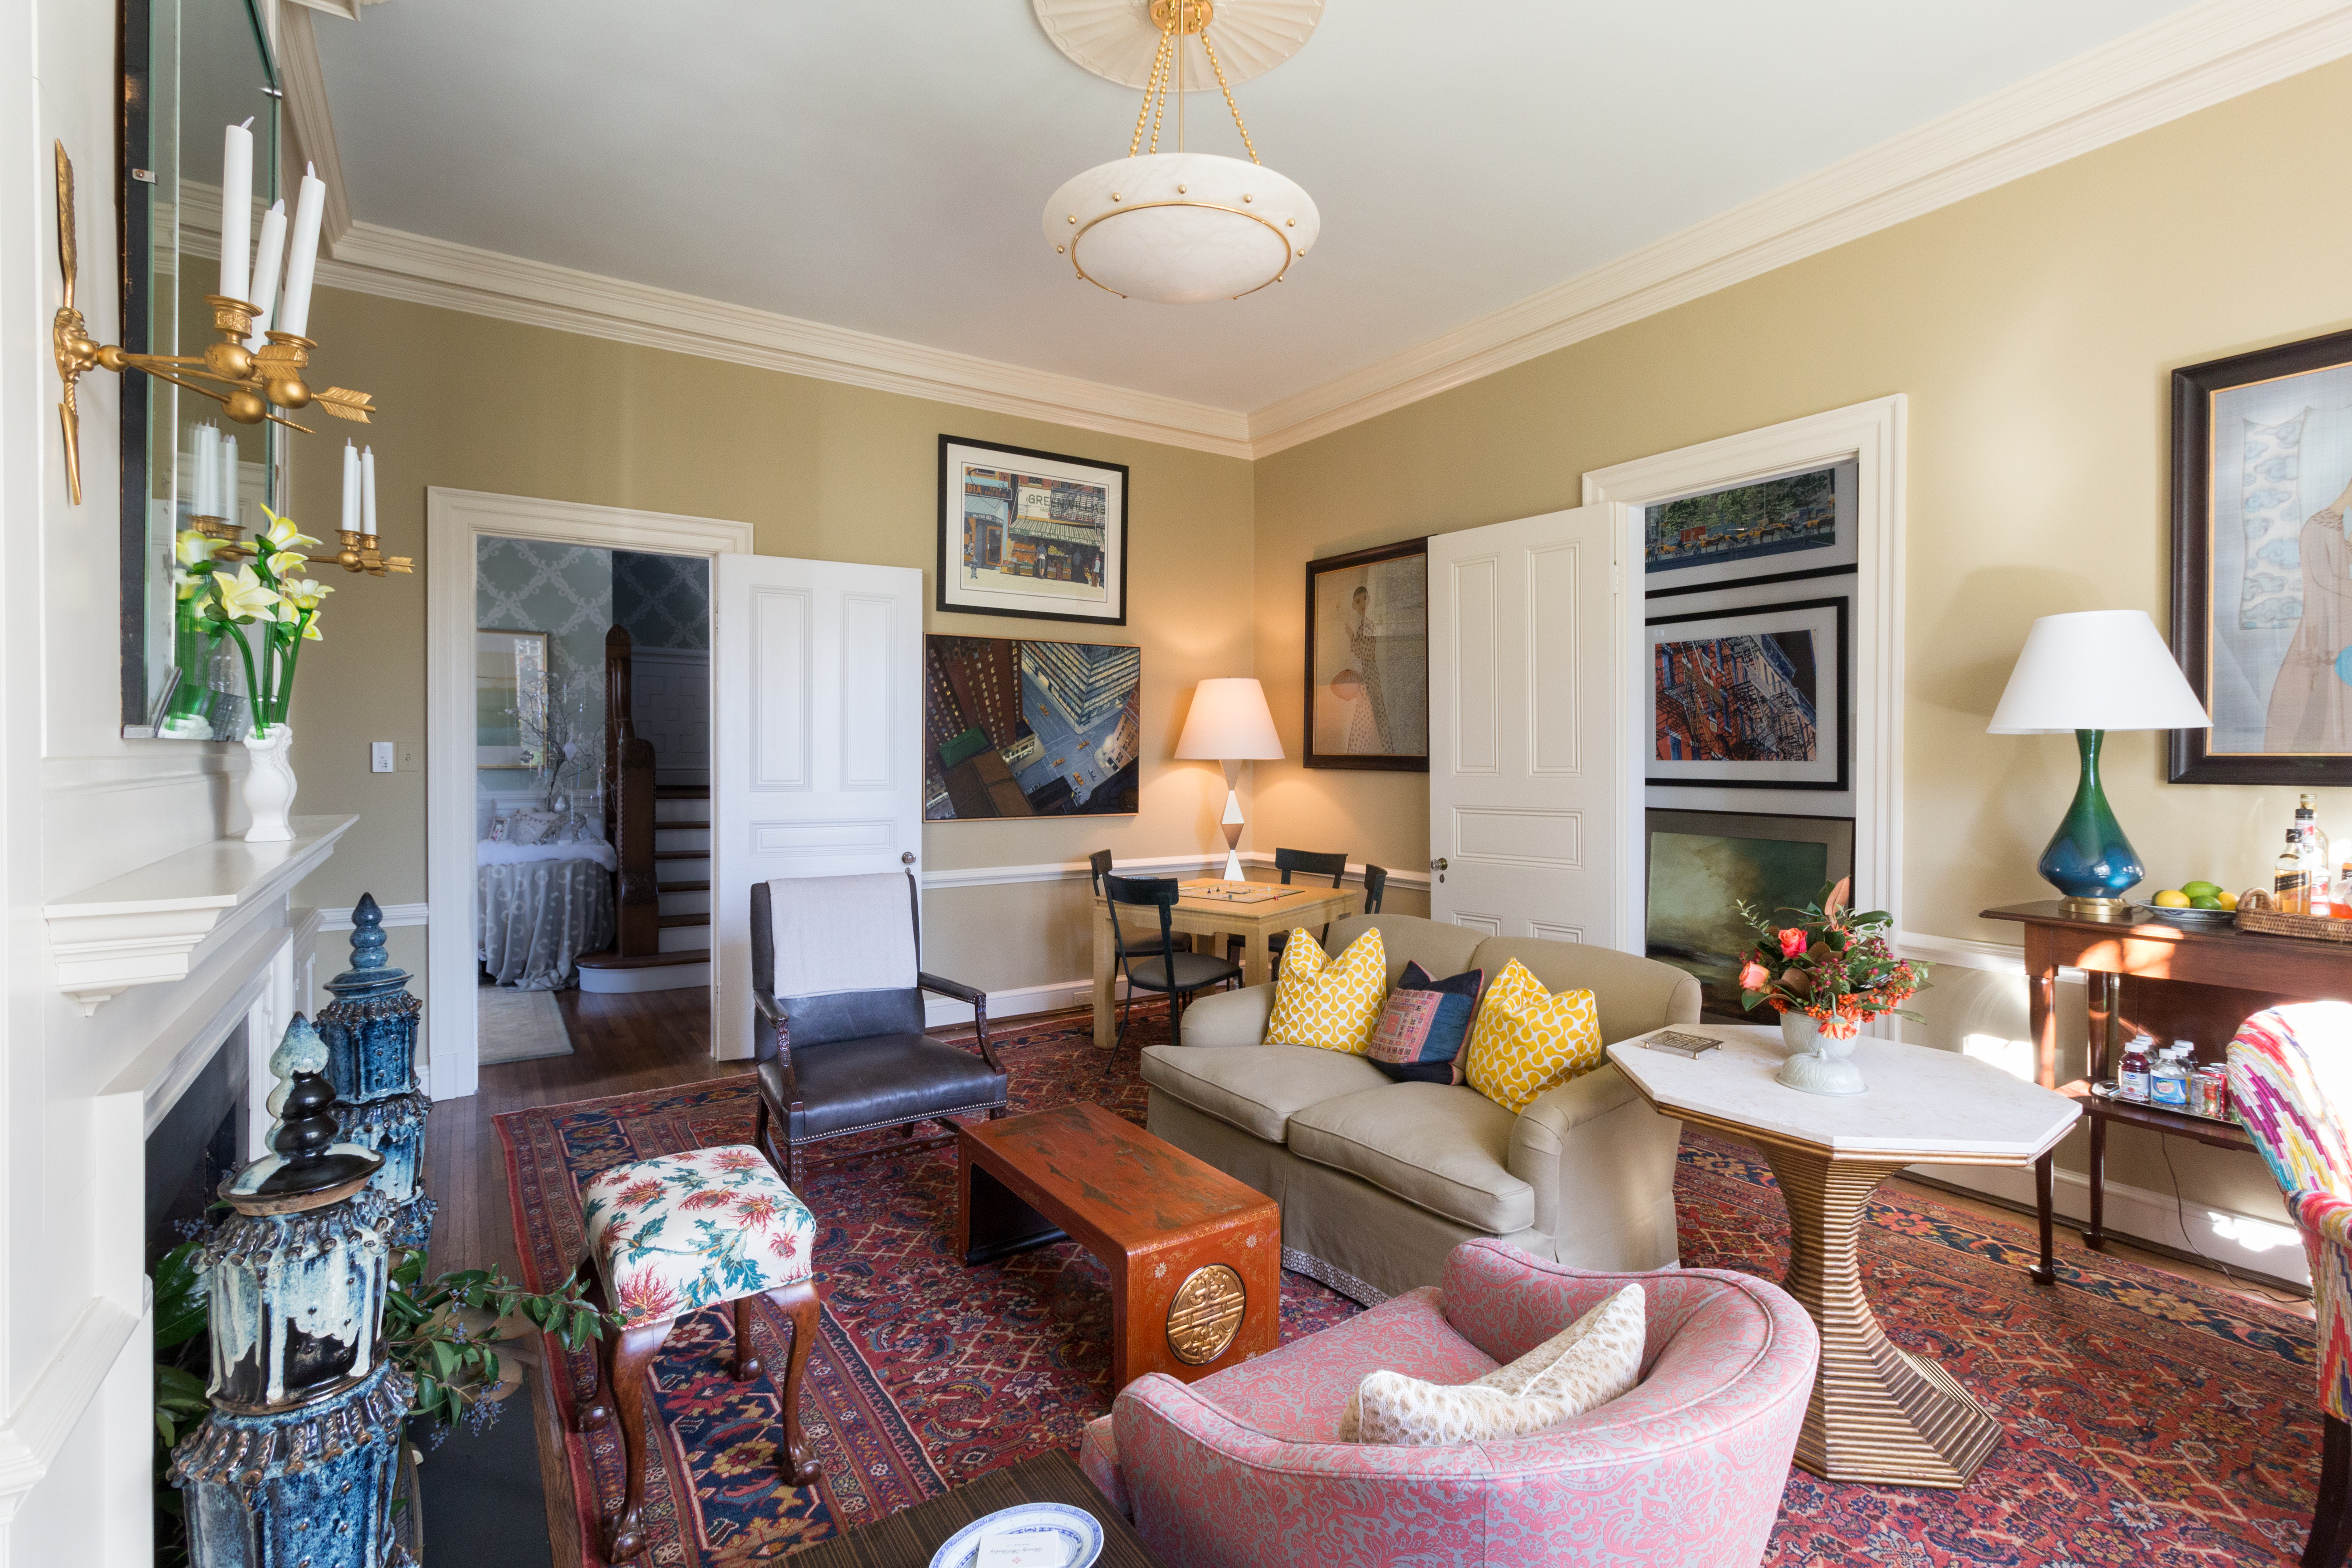 Beverly McCloskey - Design House Reshoot - No Watermark-1.jpg